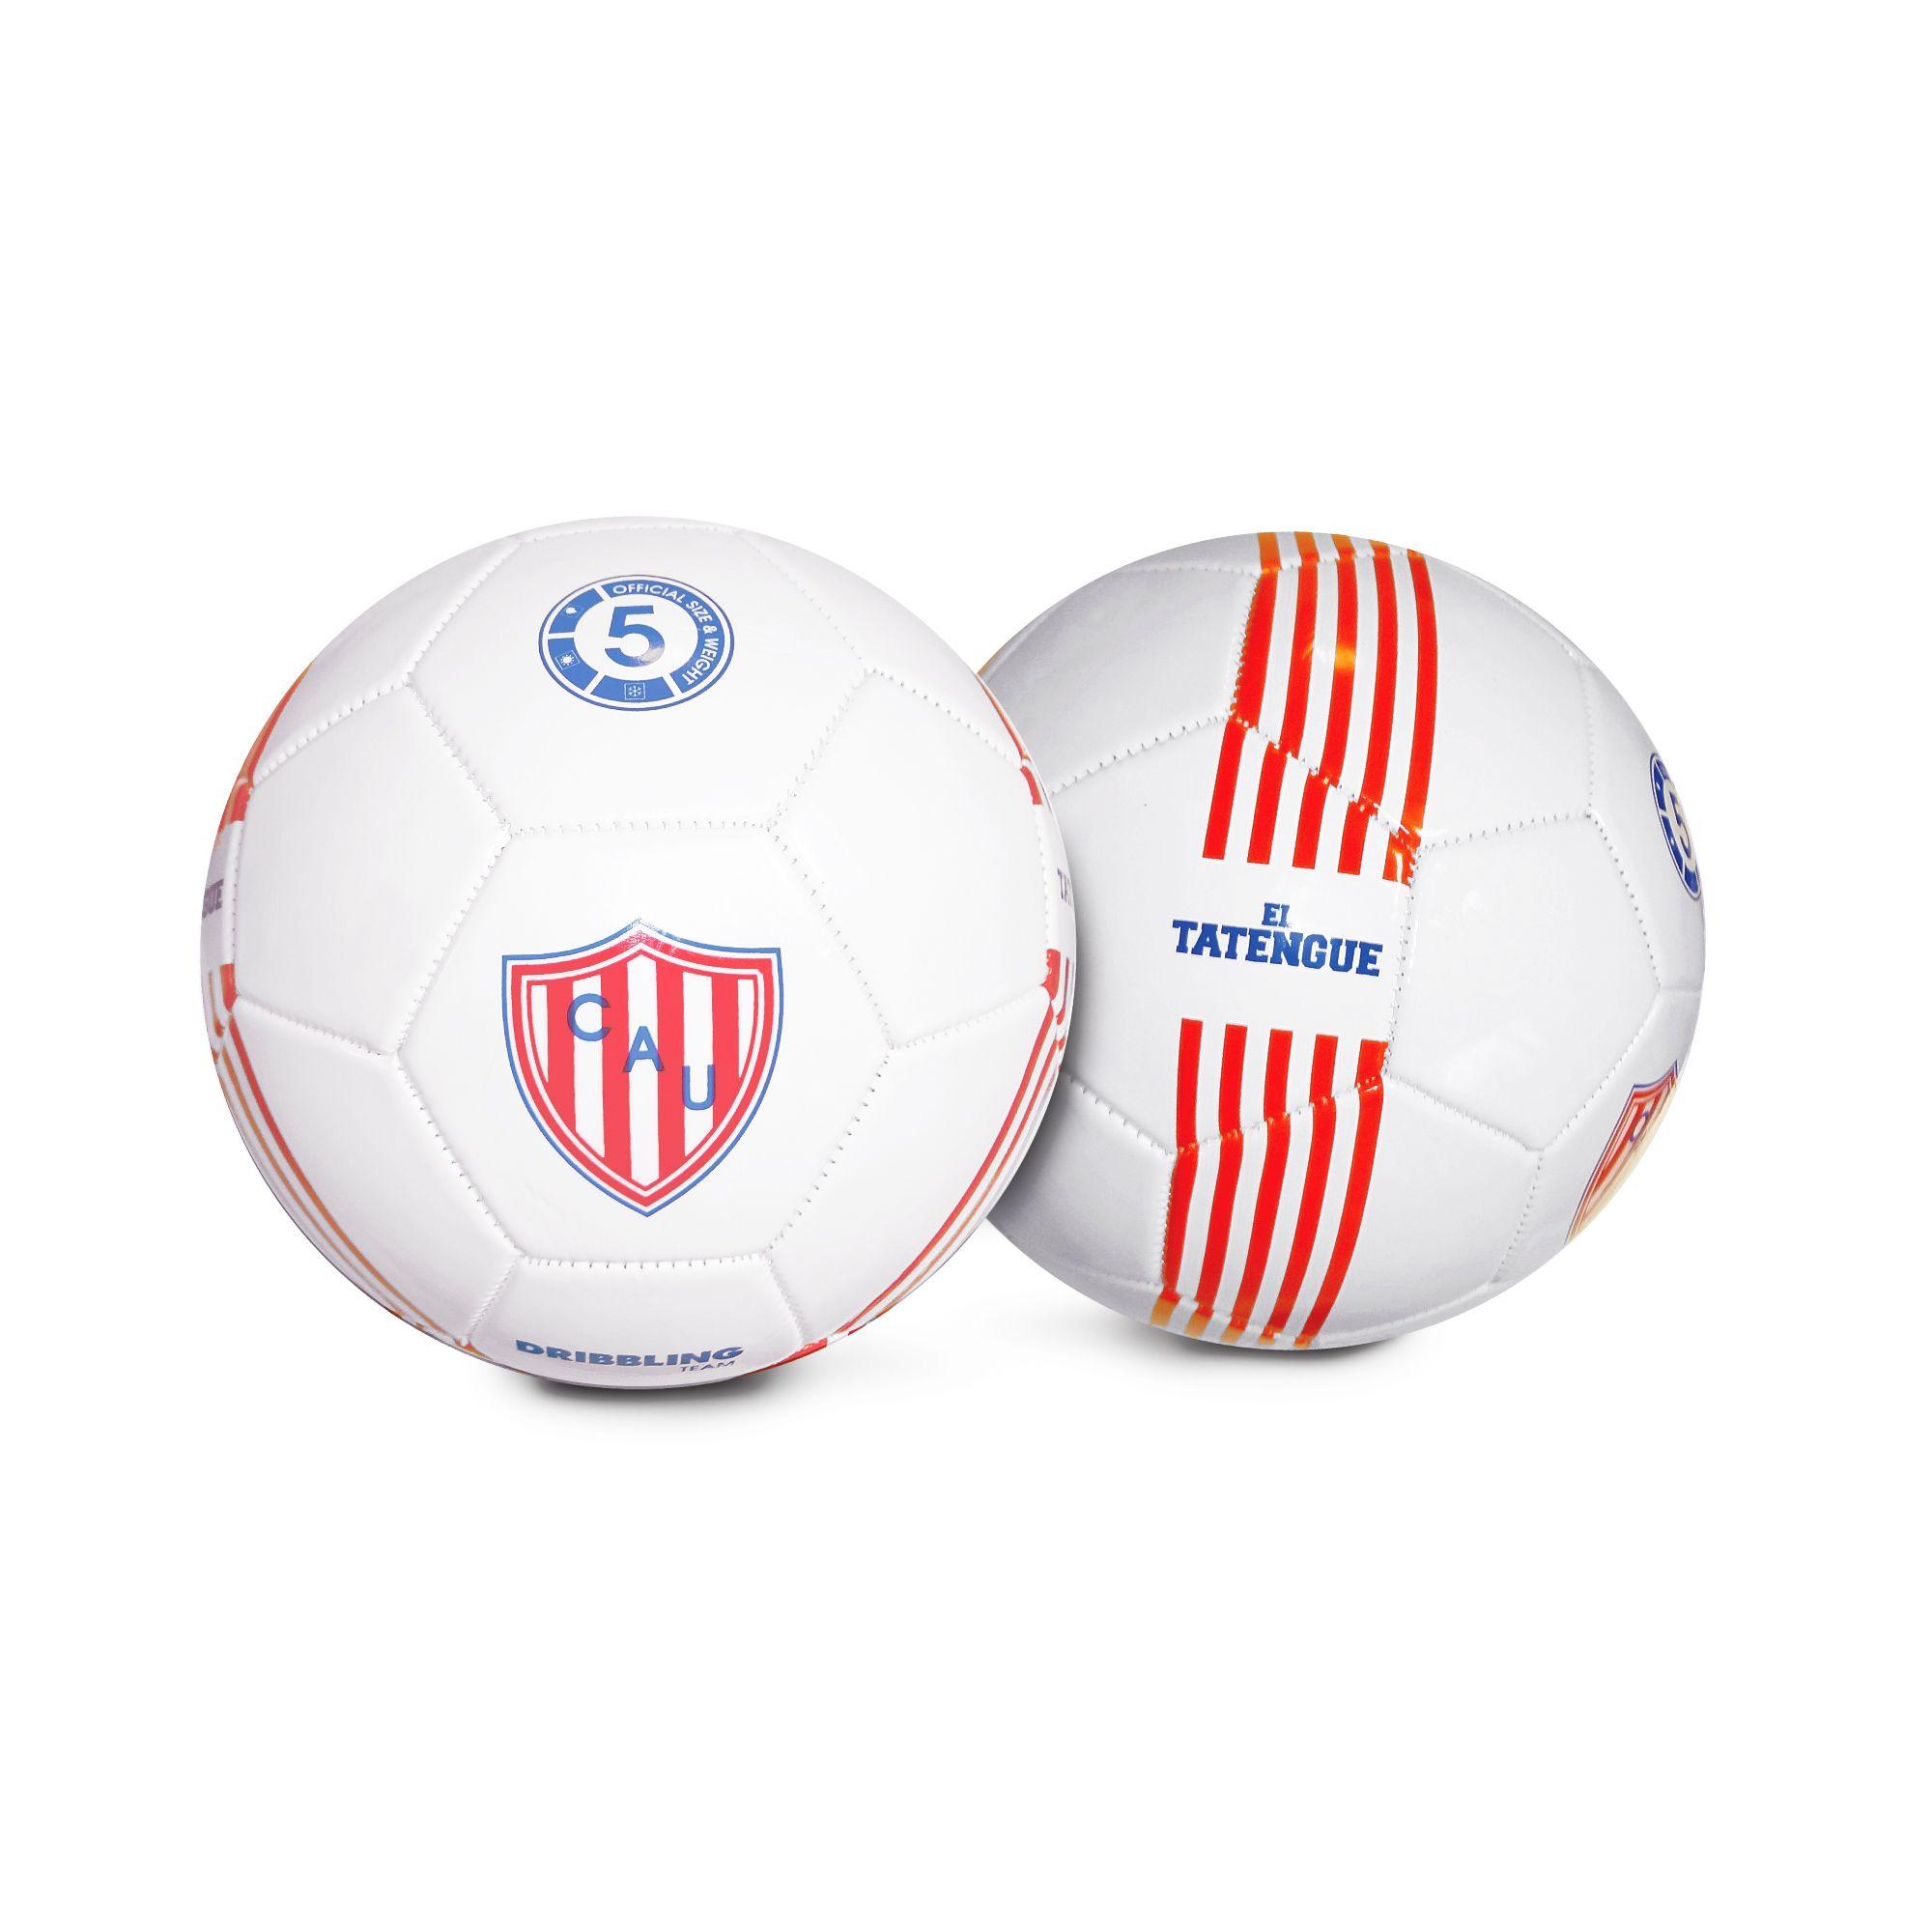 #Pelota de #futbol #Dribbling Libertadores #UnionDeSantaFe #ElTatengue  PVC. Cosida a máquina. 32 paneles. Entretenimiento. #SoccerBall #Soccer #Ball #Deporte #Sport